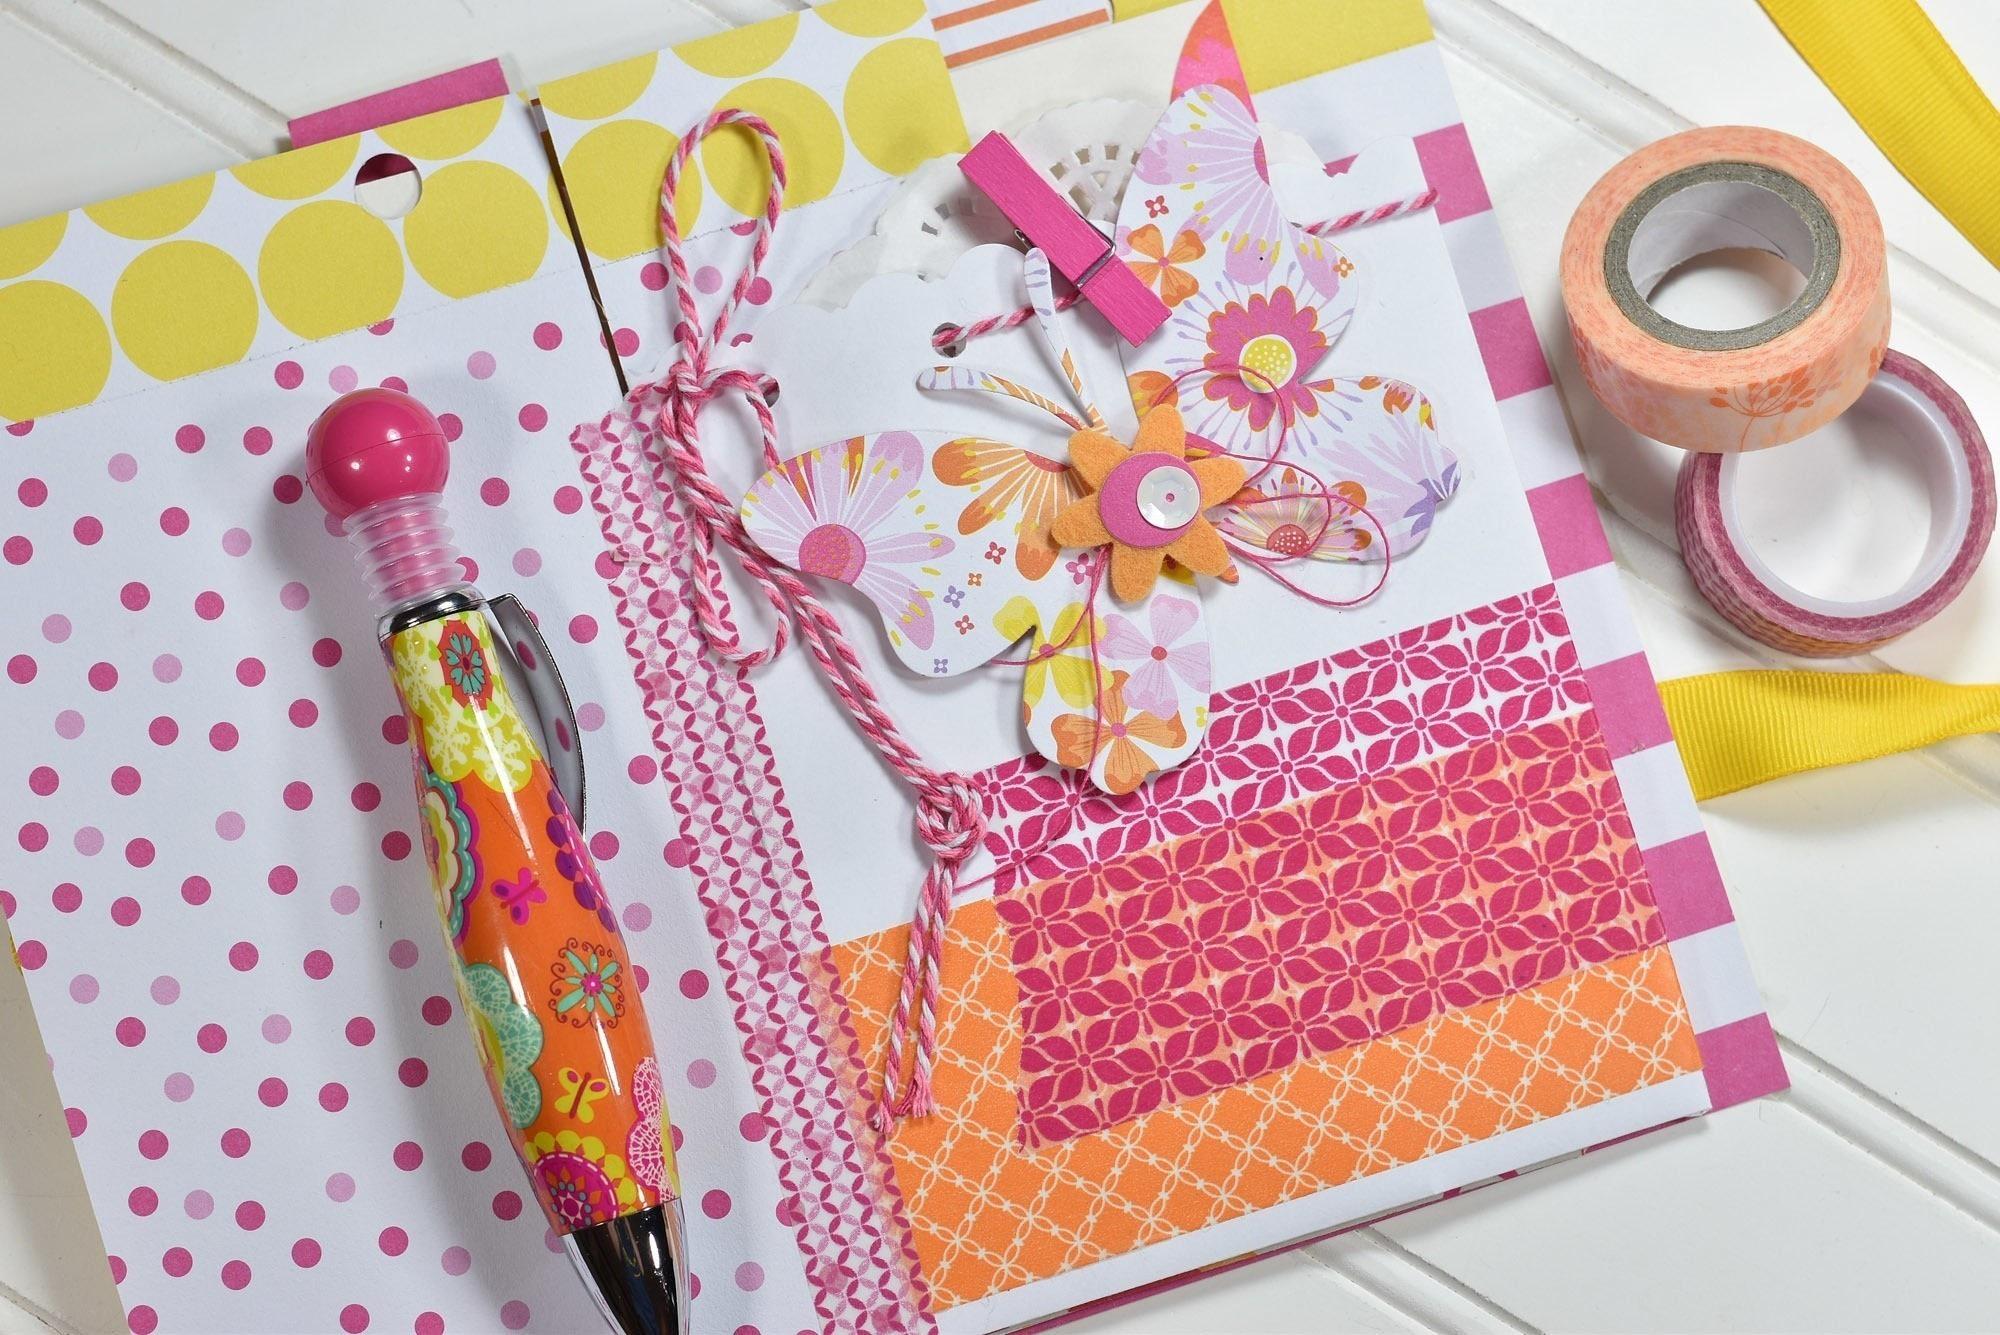 Washi tape bound journal how to decorate an altered - Como hacer un album de fotos ...